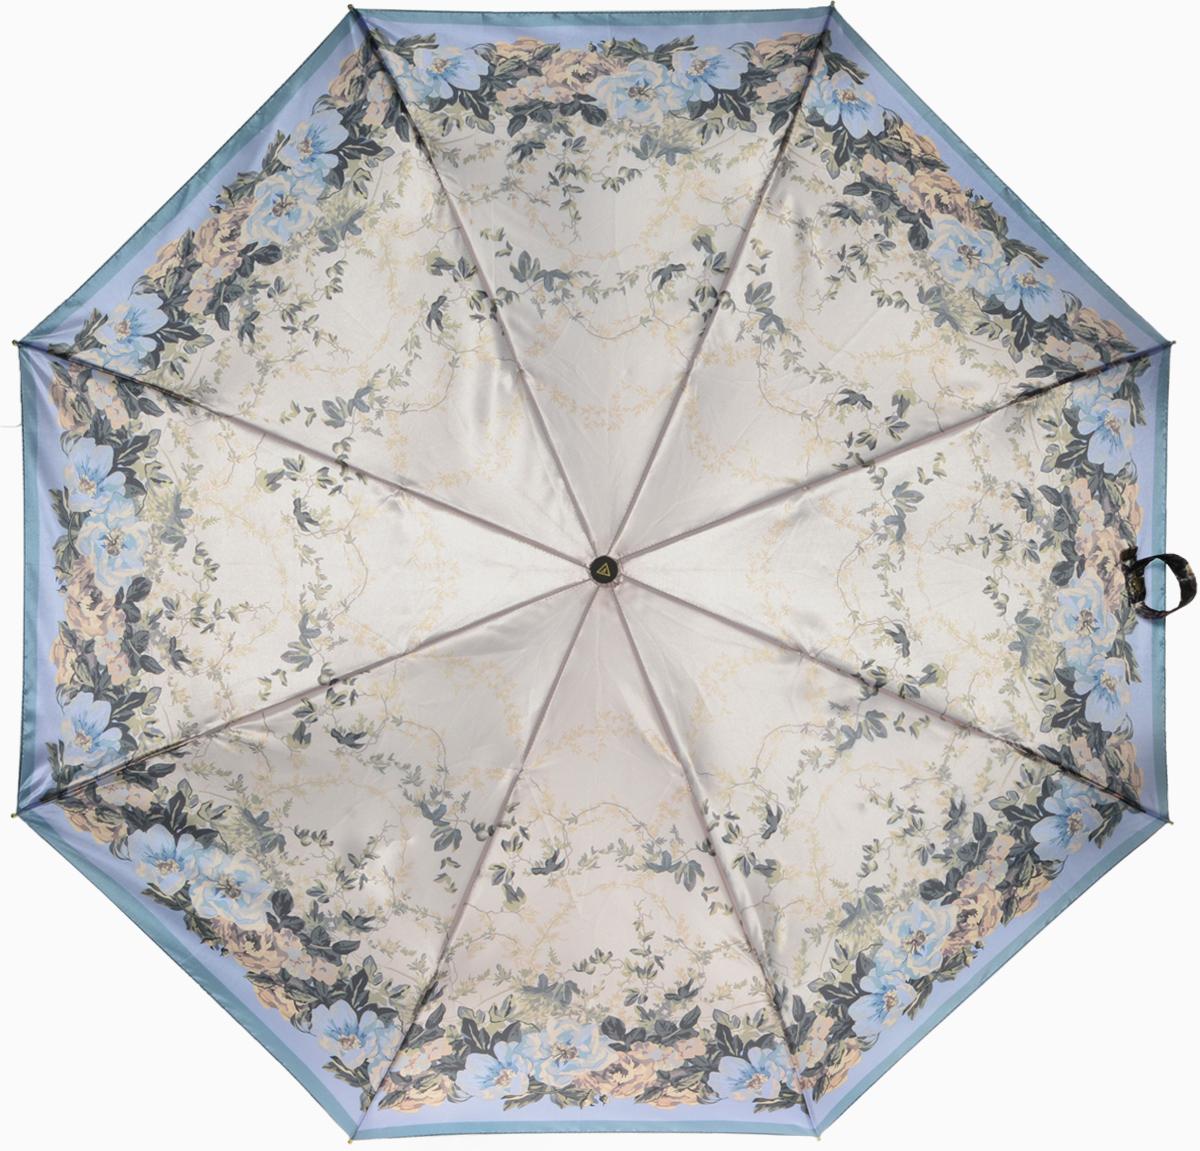 Зонт женский Fabretti, автомат, 3 сложения, цвет: мультиколор. L-16107-28L-16107-28Зонт женский Fabretti, облегченный суперавтомат, 3 сложения